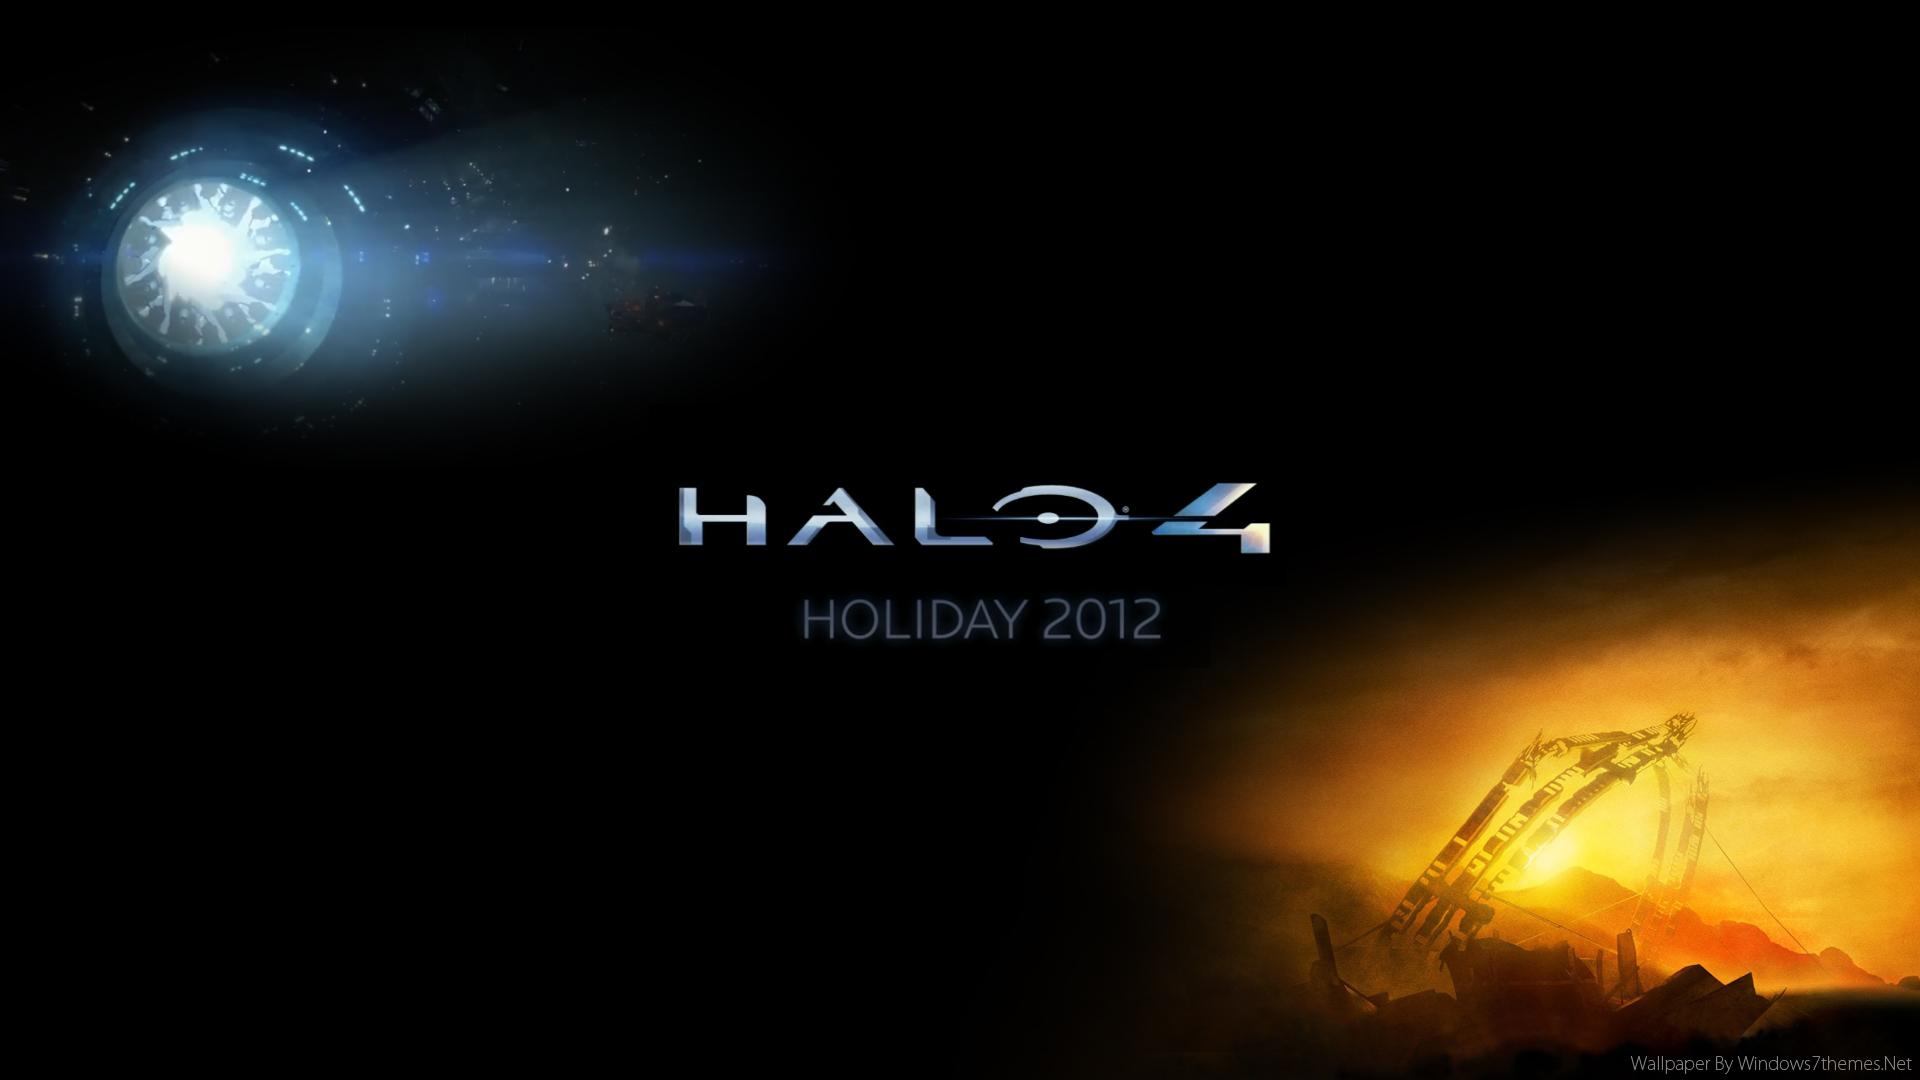 halo 4 – holiday 2012.jpg